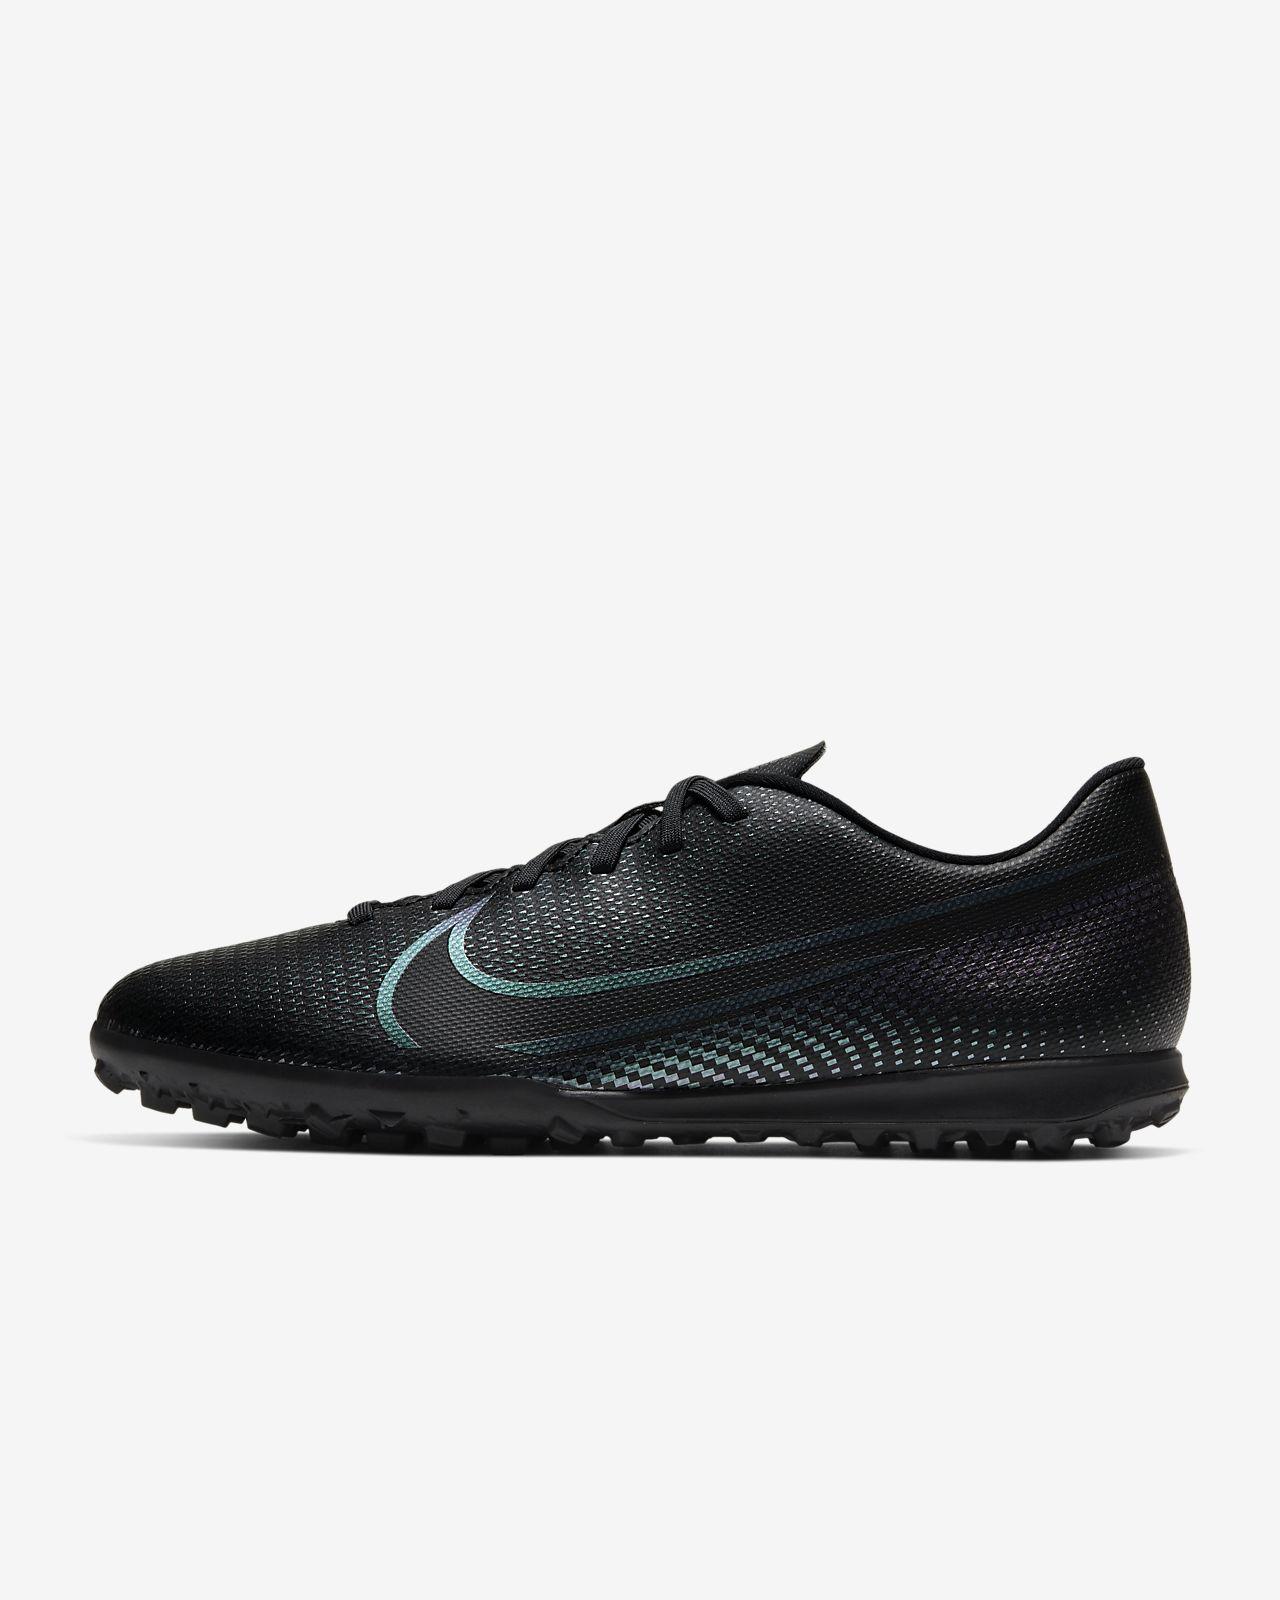 Chaussure de football pour surface synthétique Nike Mercurial Vapor 13 Club TF